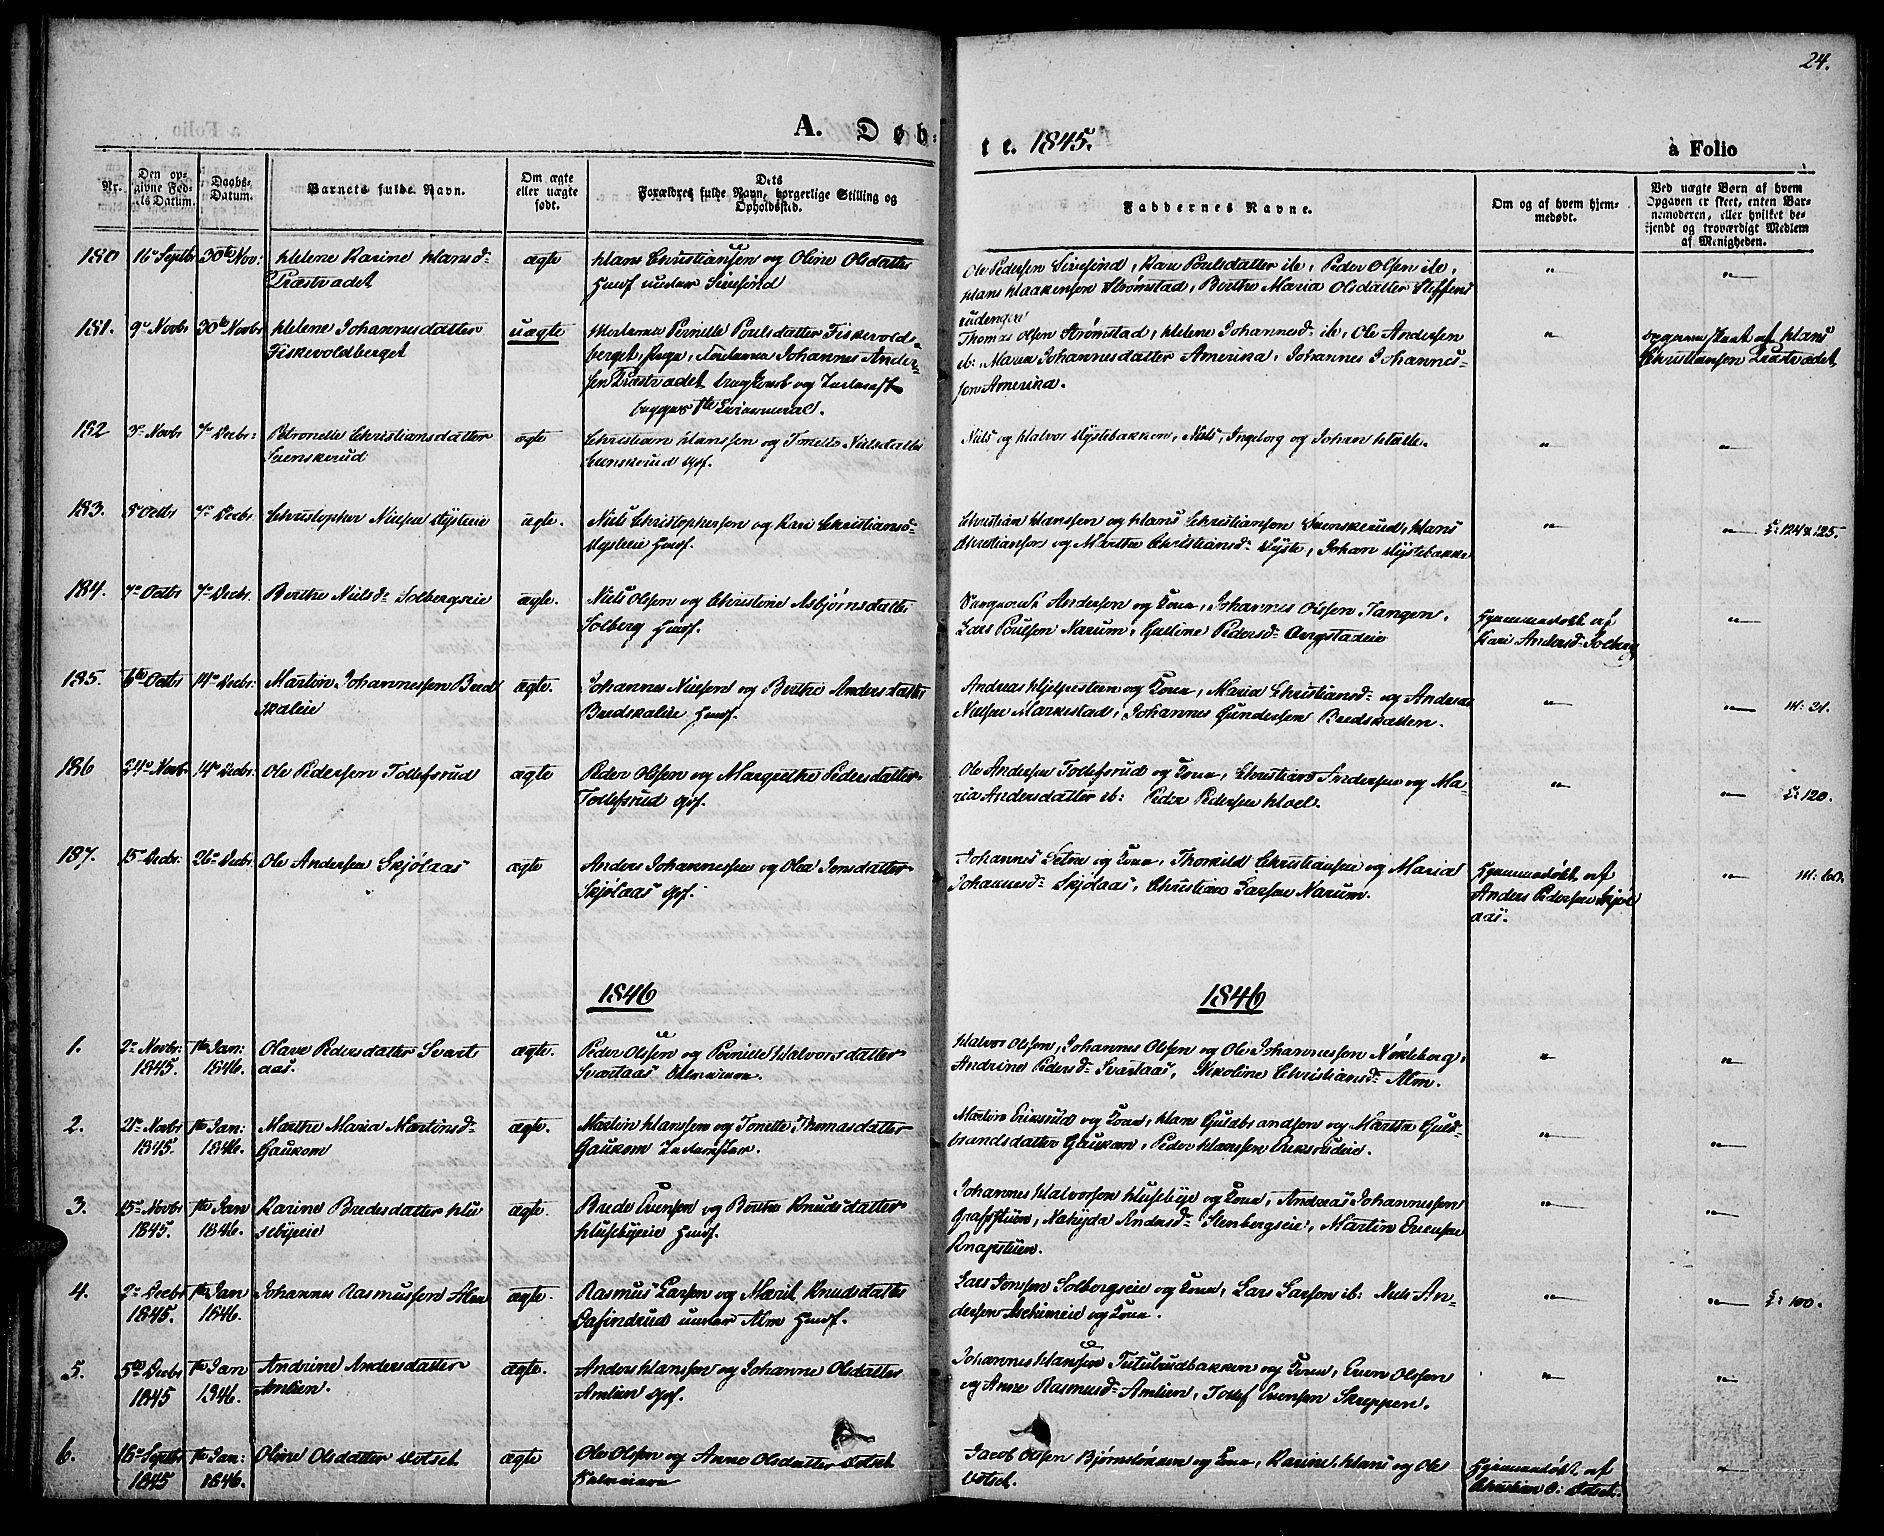 SAH, Vestre Toten prestekontor, H/Ha/Haa/L0004: Ministerialbok nr. 4, 1844-1849, s. 24